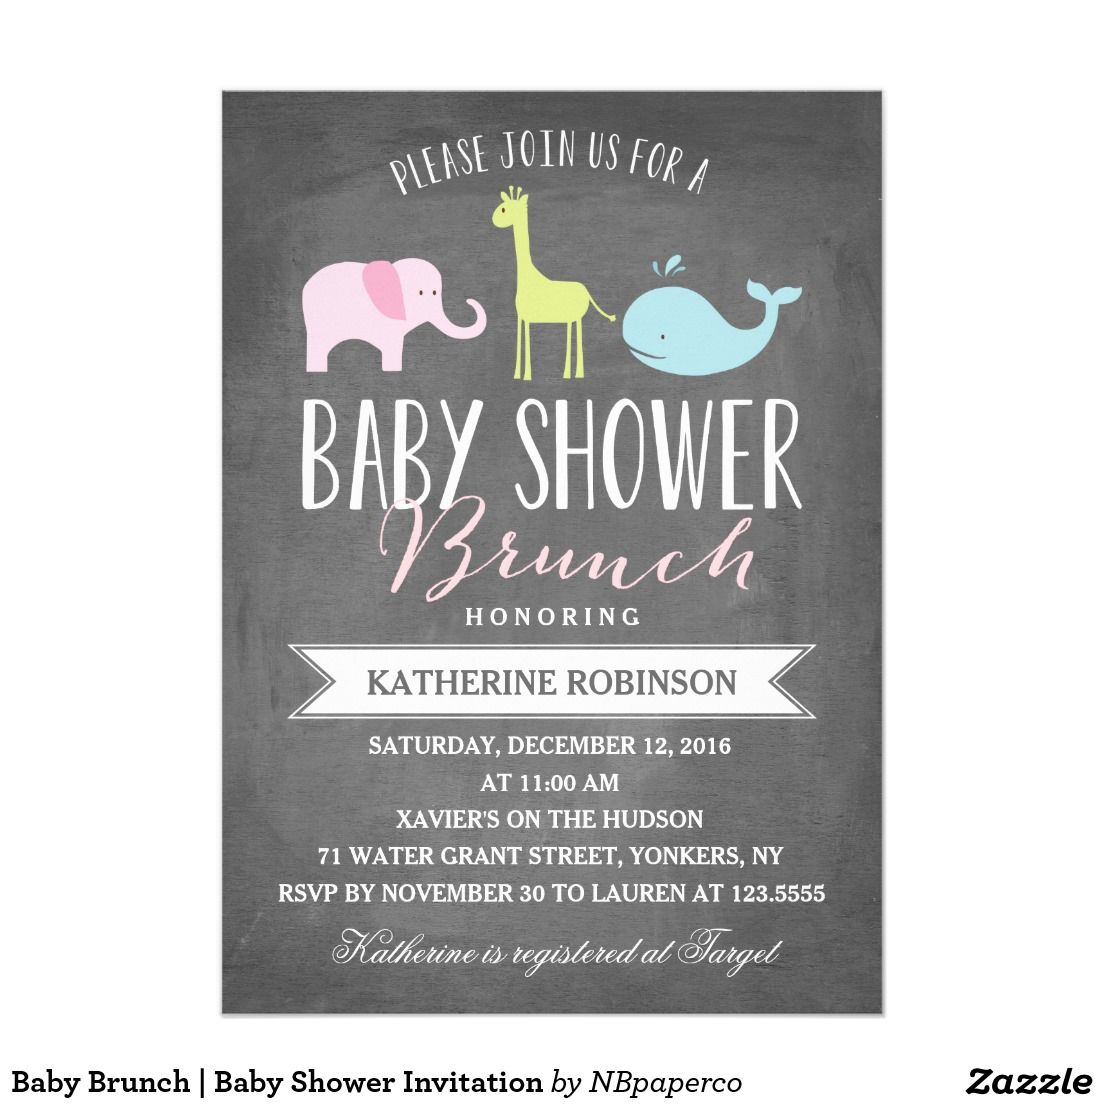 Baby Brunch | Baby Shower Invitation | celebrations | Pinterest ...